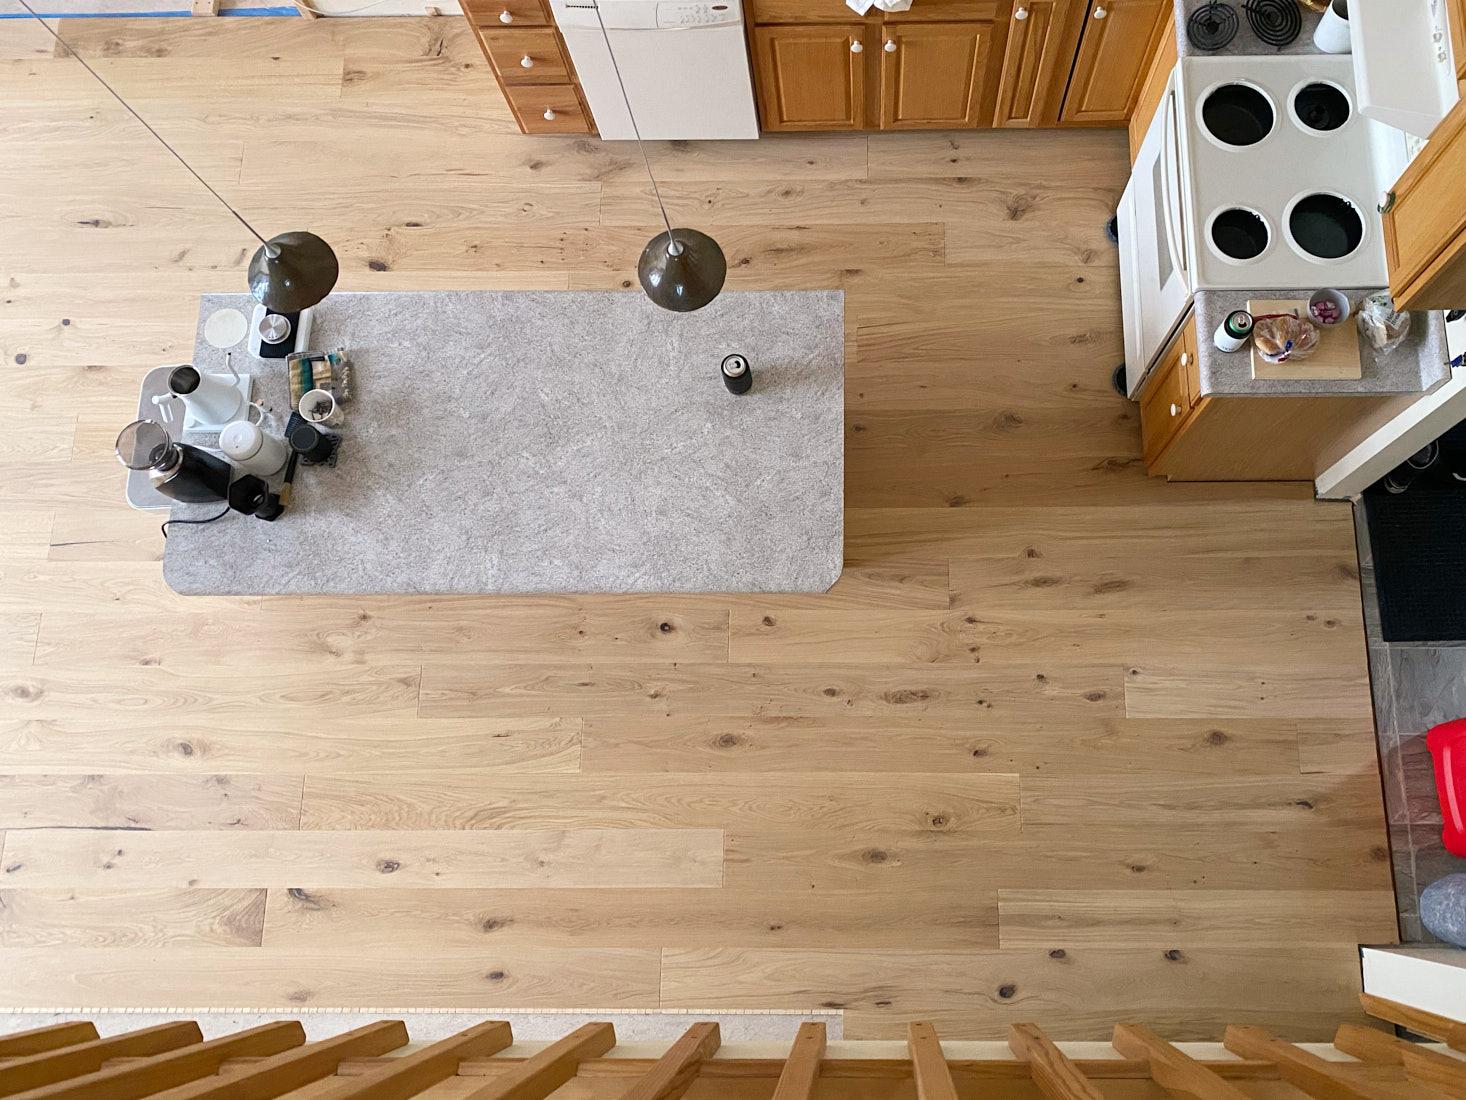 Stuga Kahrs flooring installed around existing kitchen cabinets